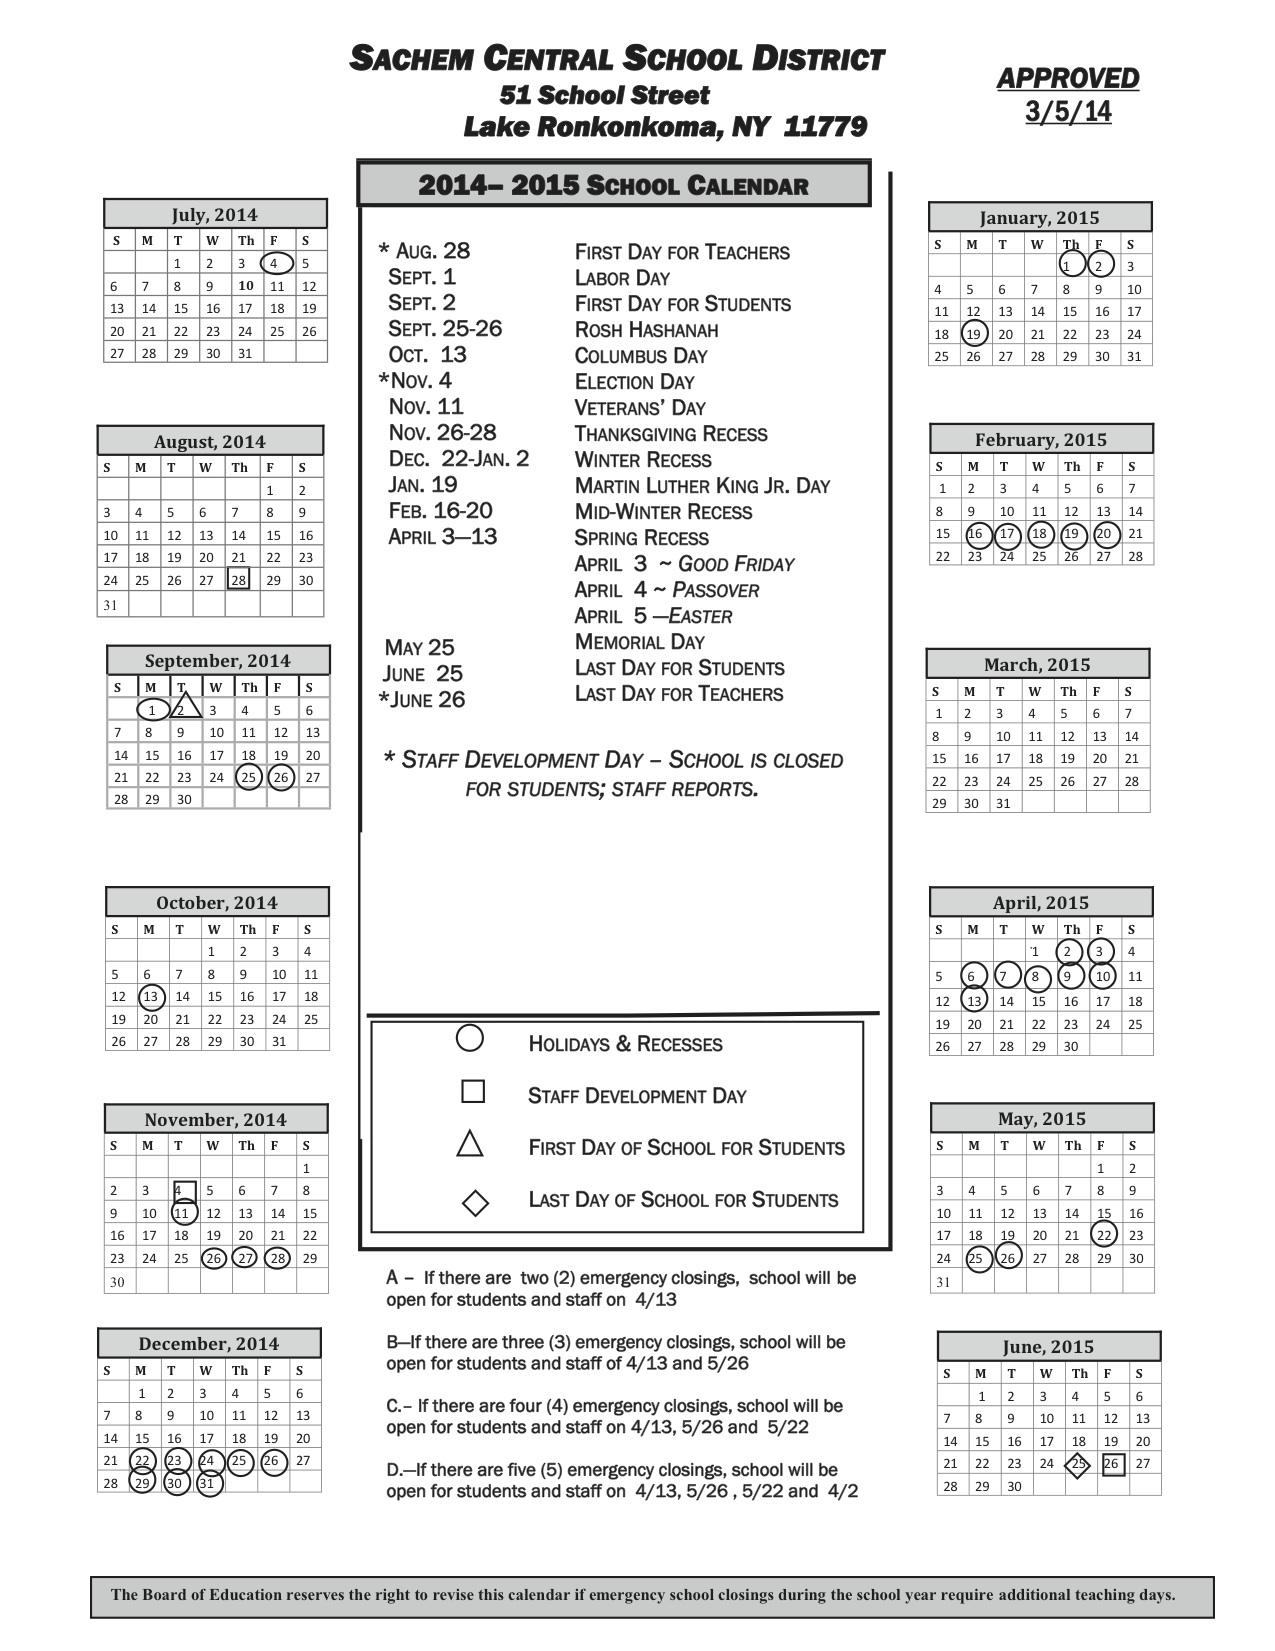 Sachem Schools 2014-2015 calendar